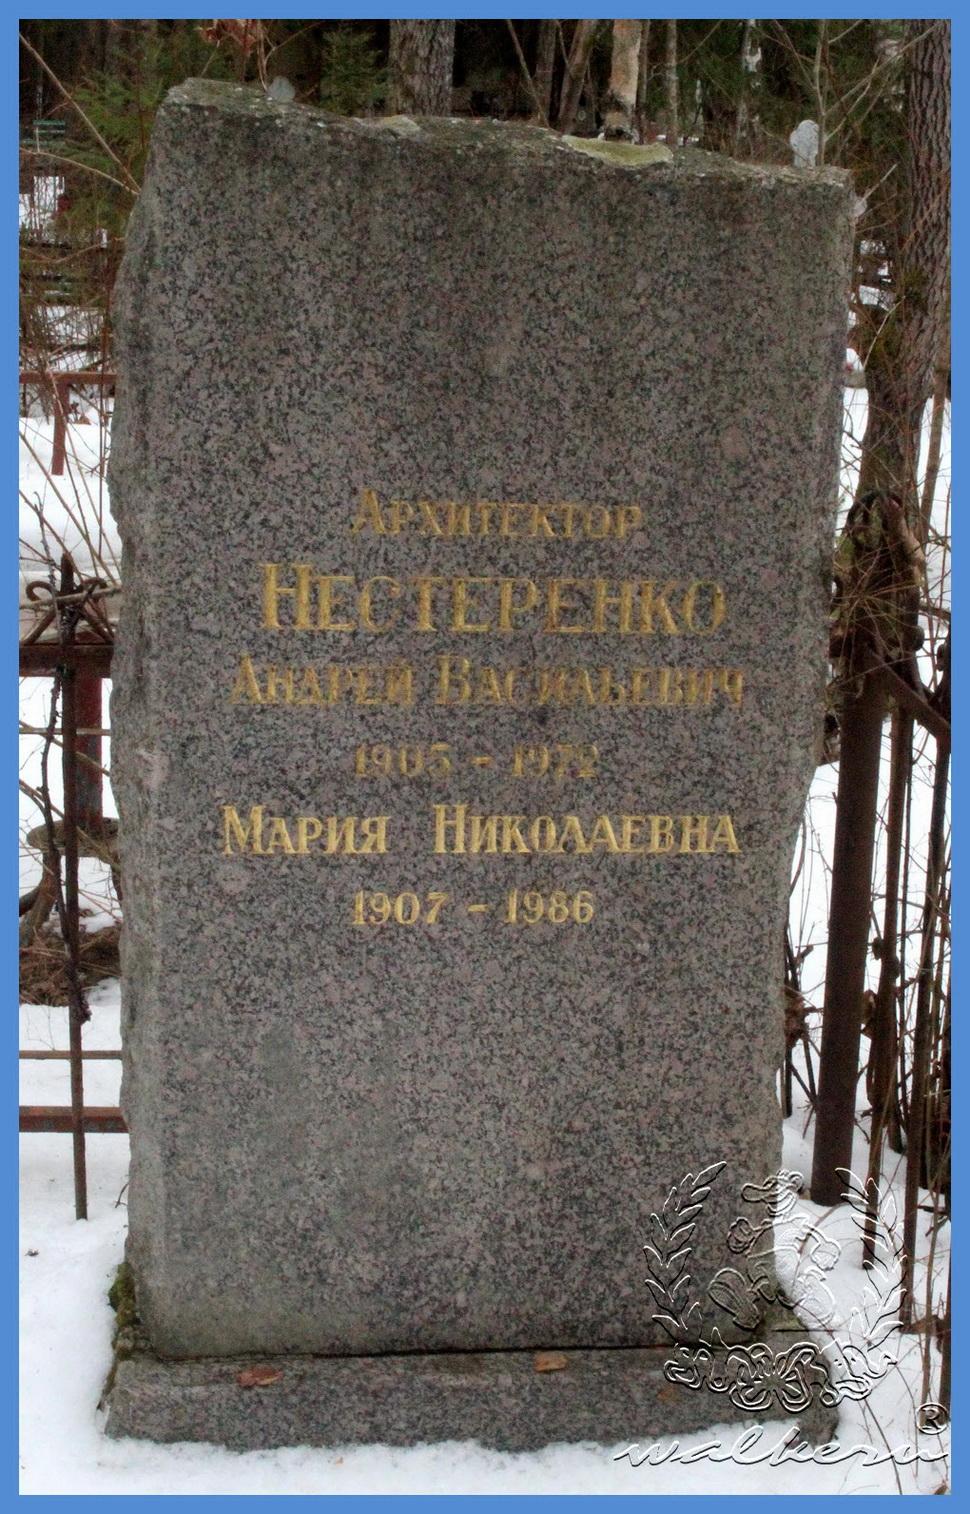 Нестеренко Андрей Васильевич